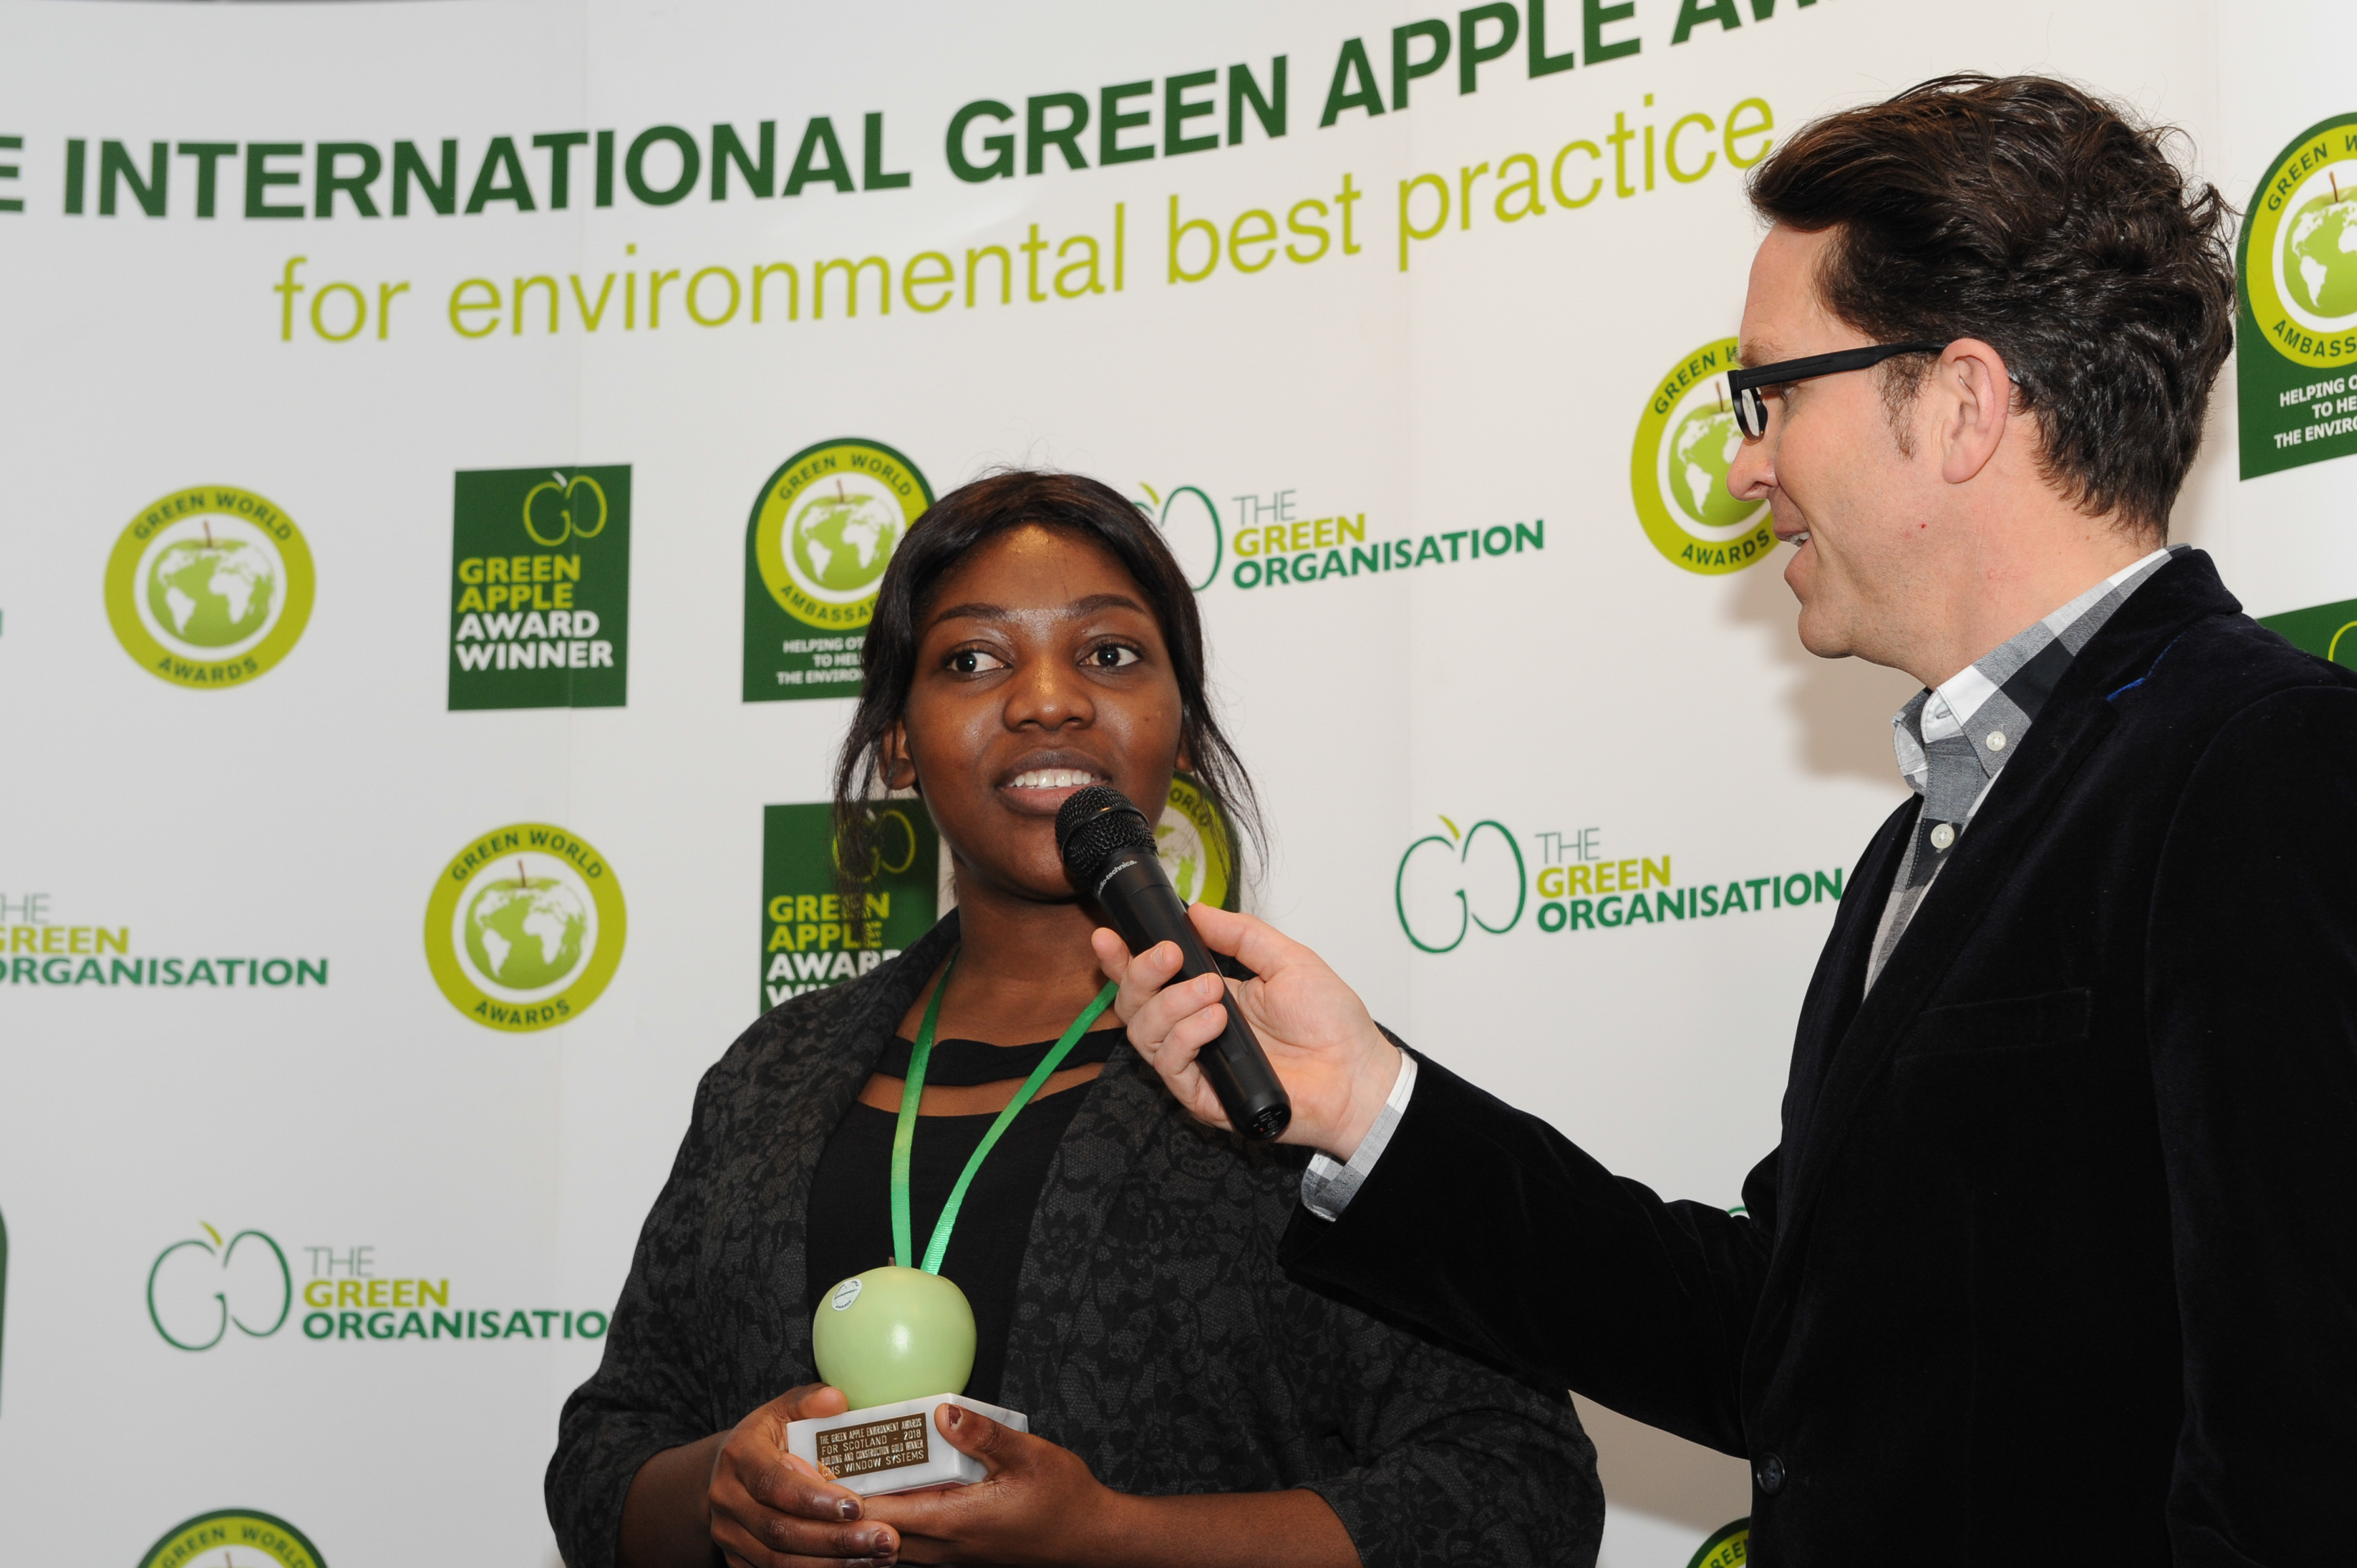 International Green Apple Awards